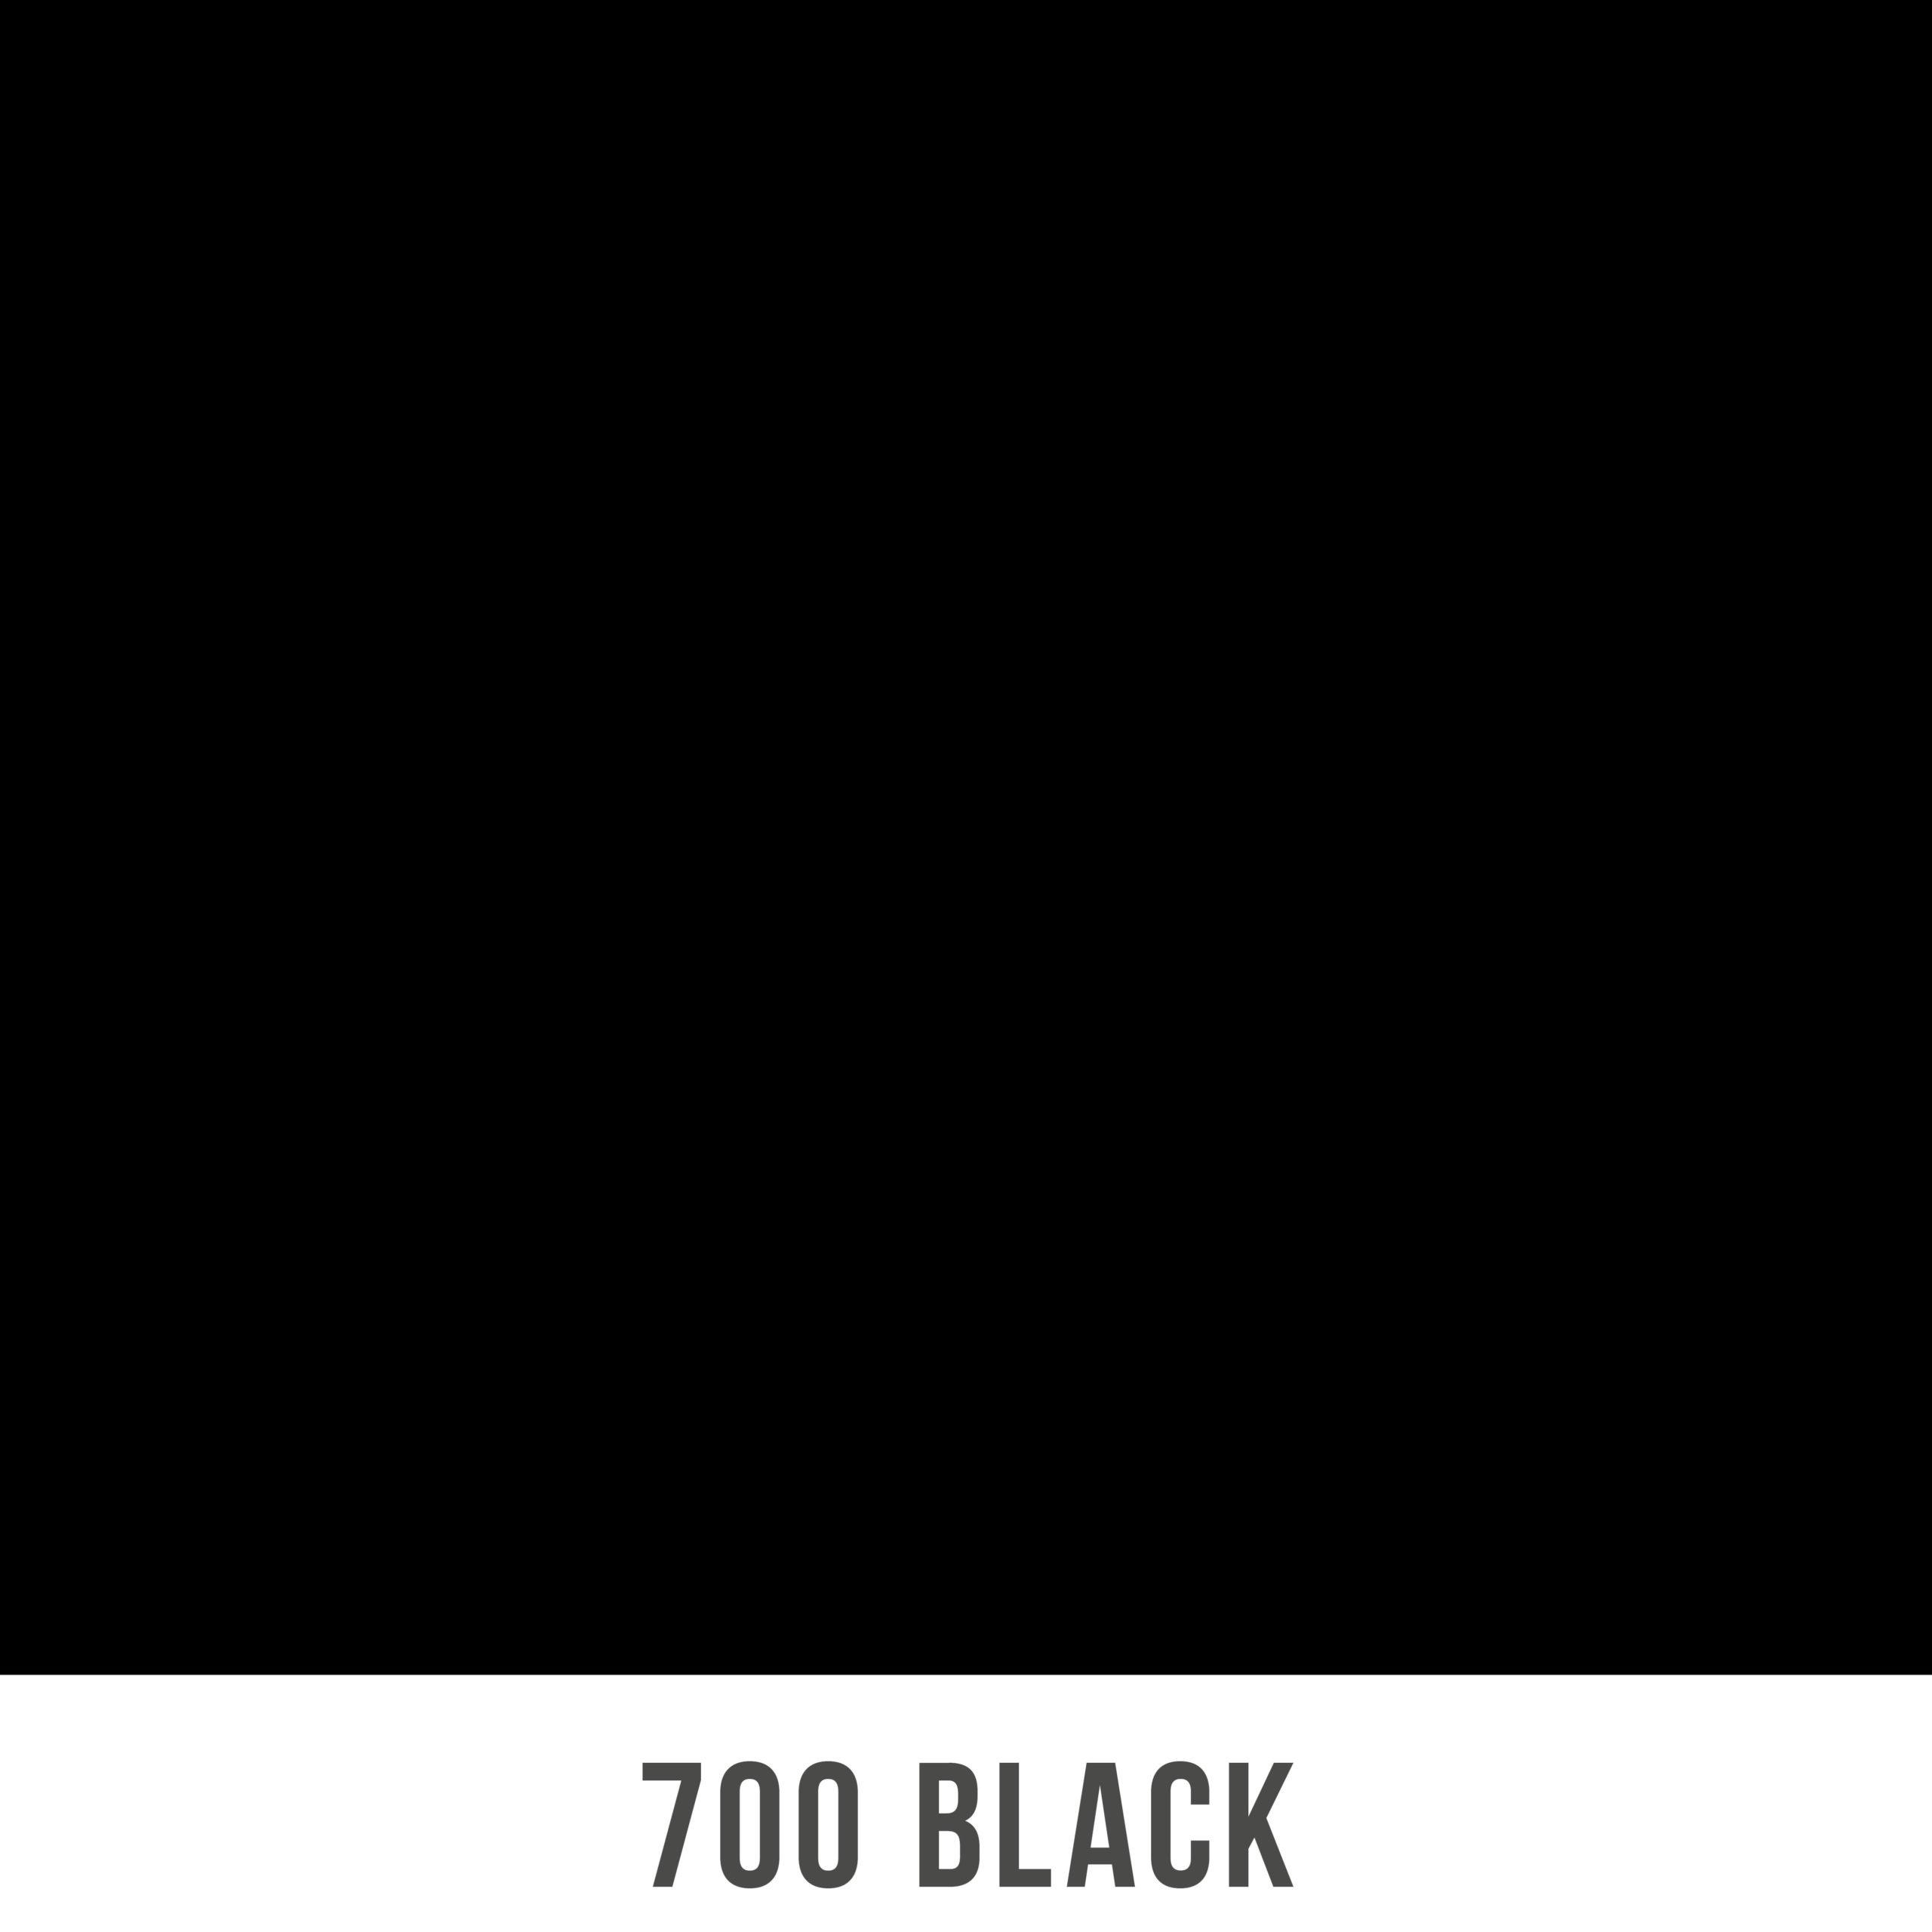 700 scaled